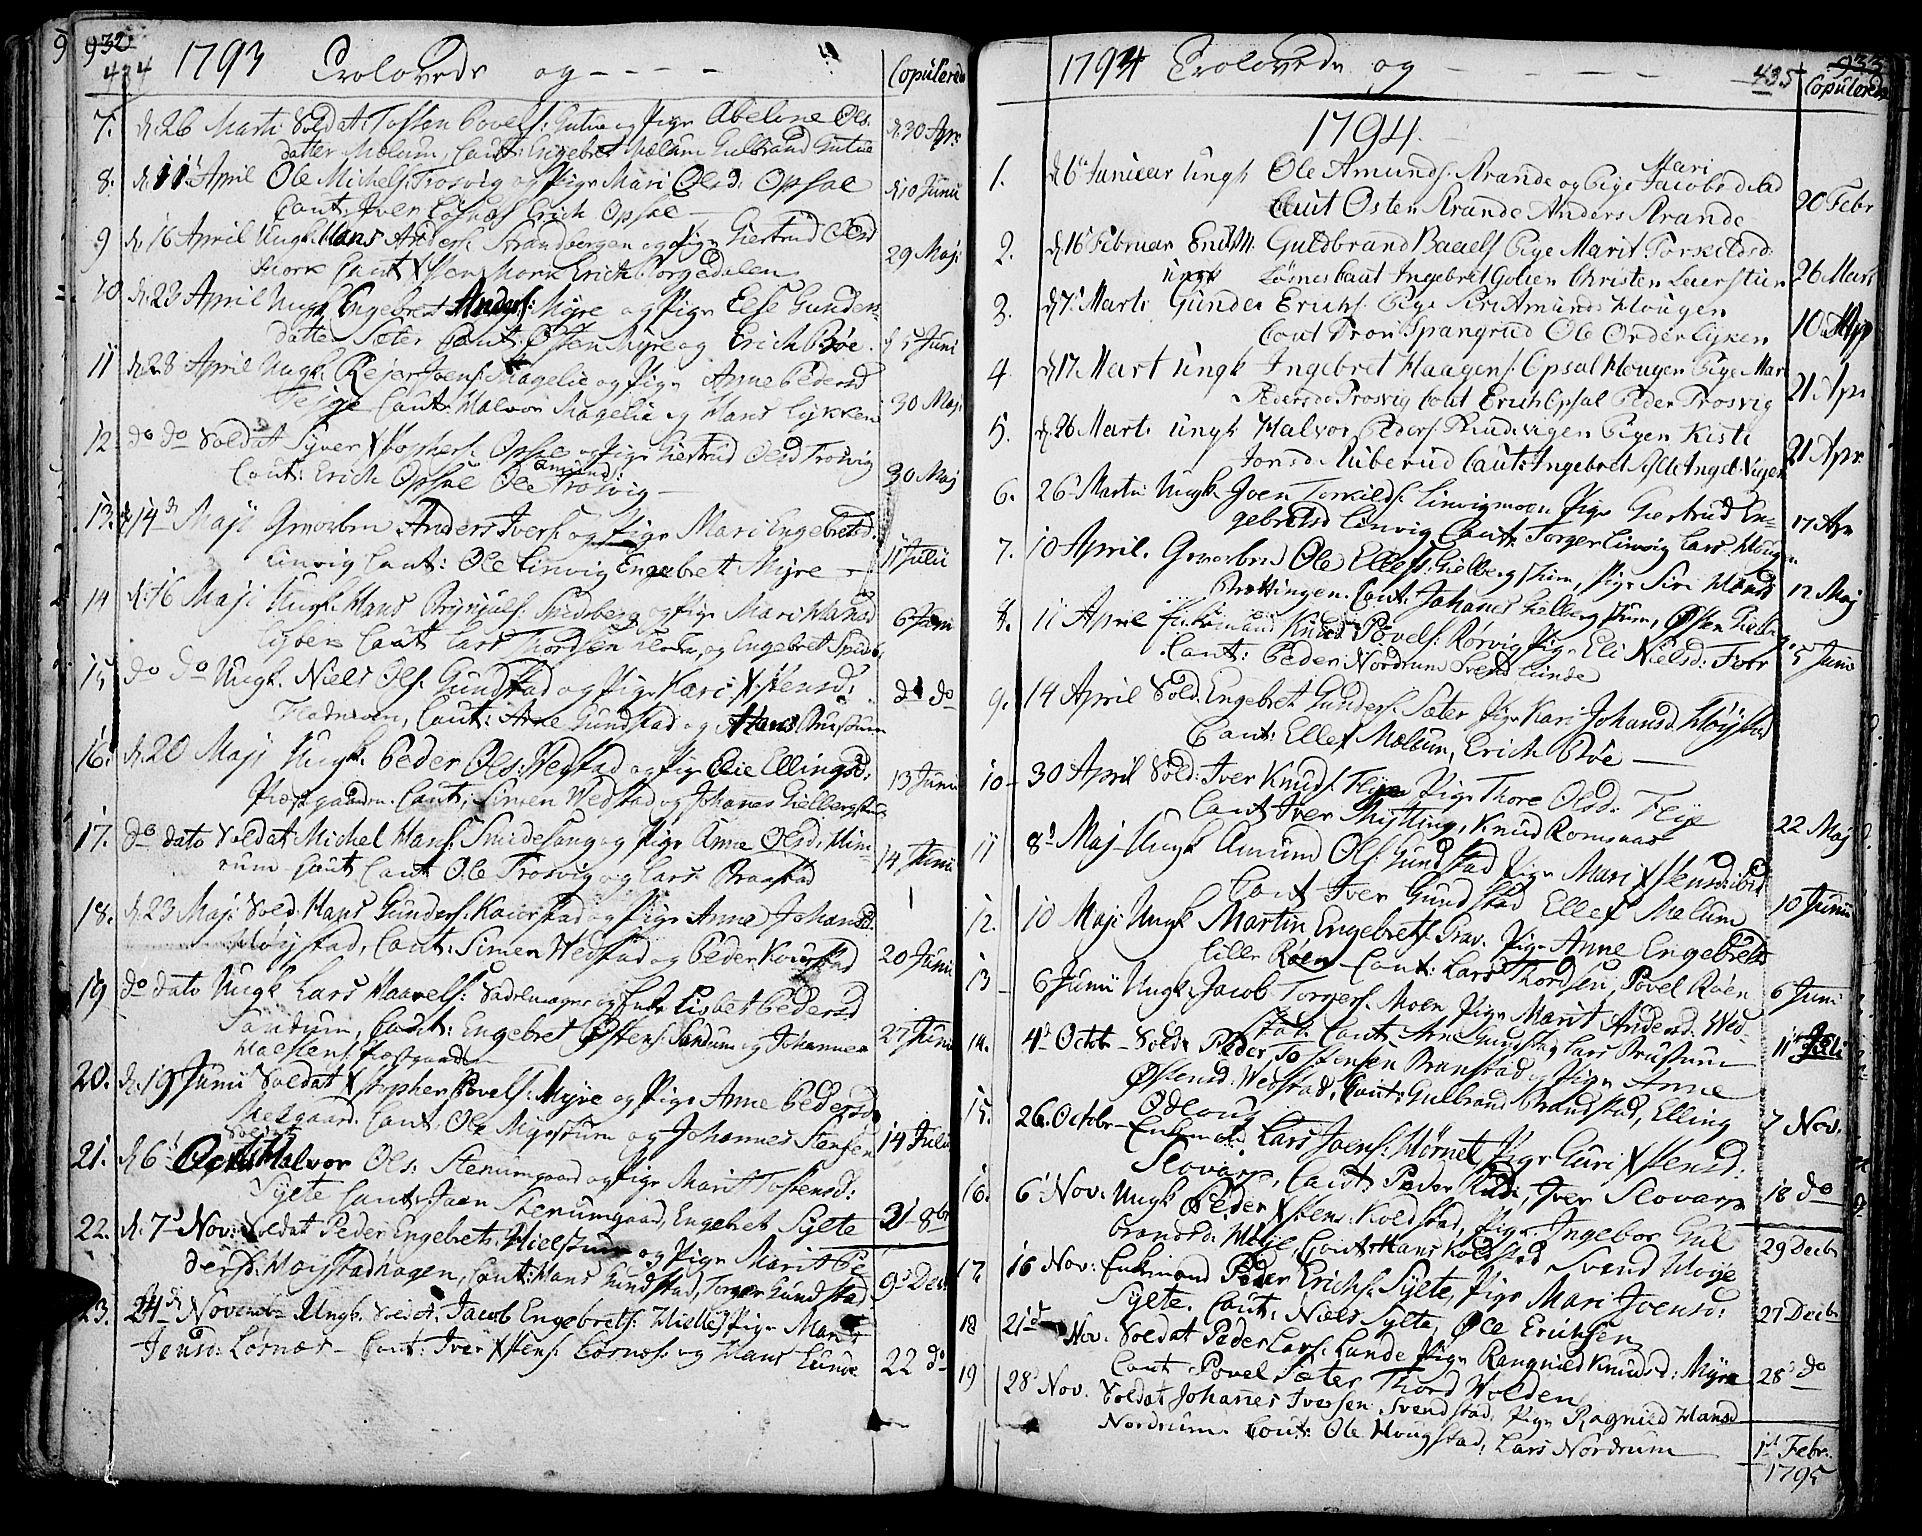 SAH, Ringebu prestekontor, Ministerialbok nr. 3, 1781-1820, s. 434-435